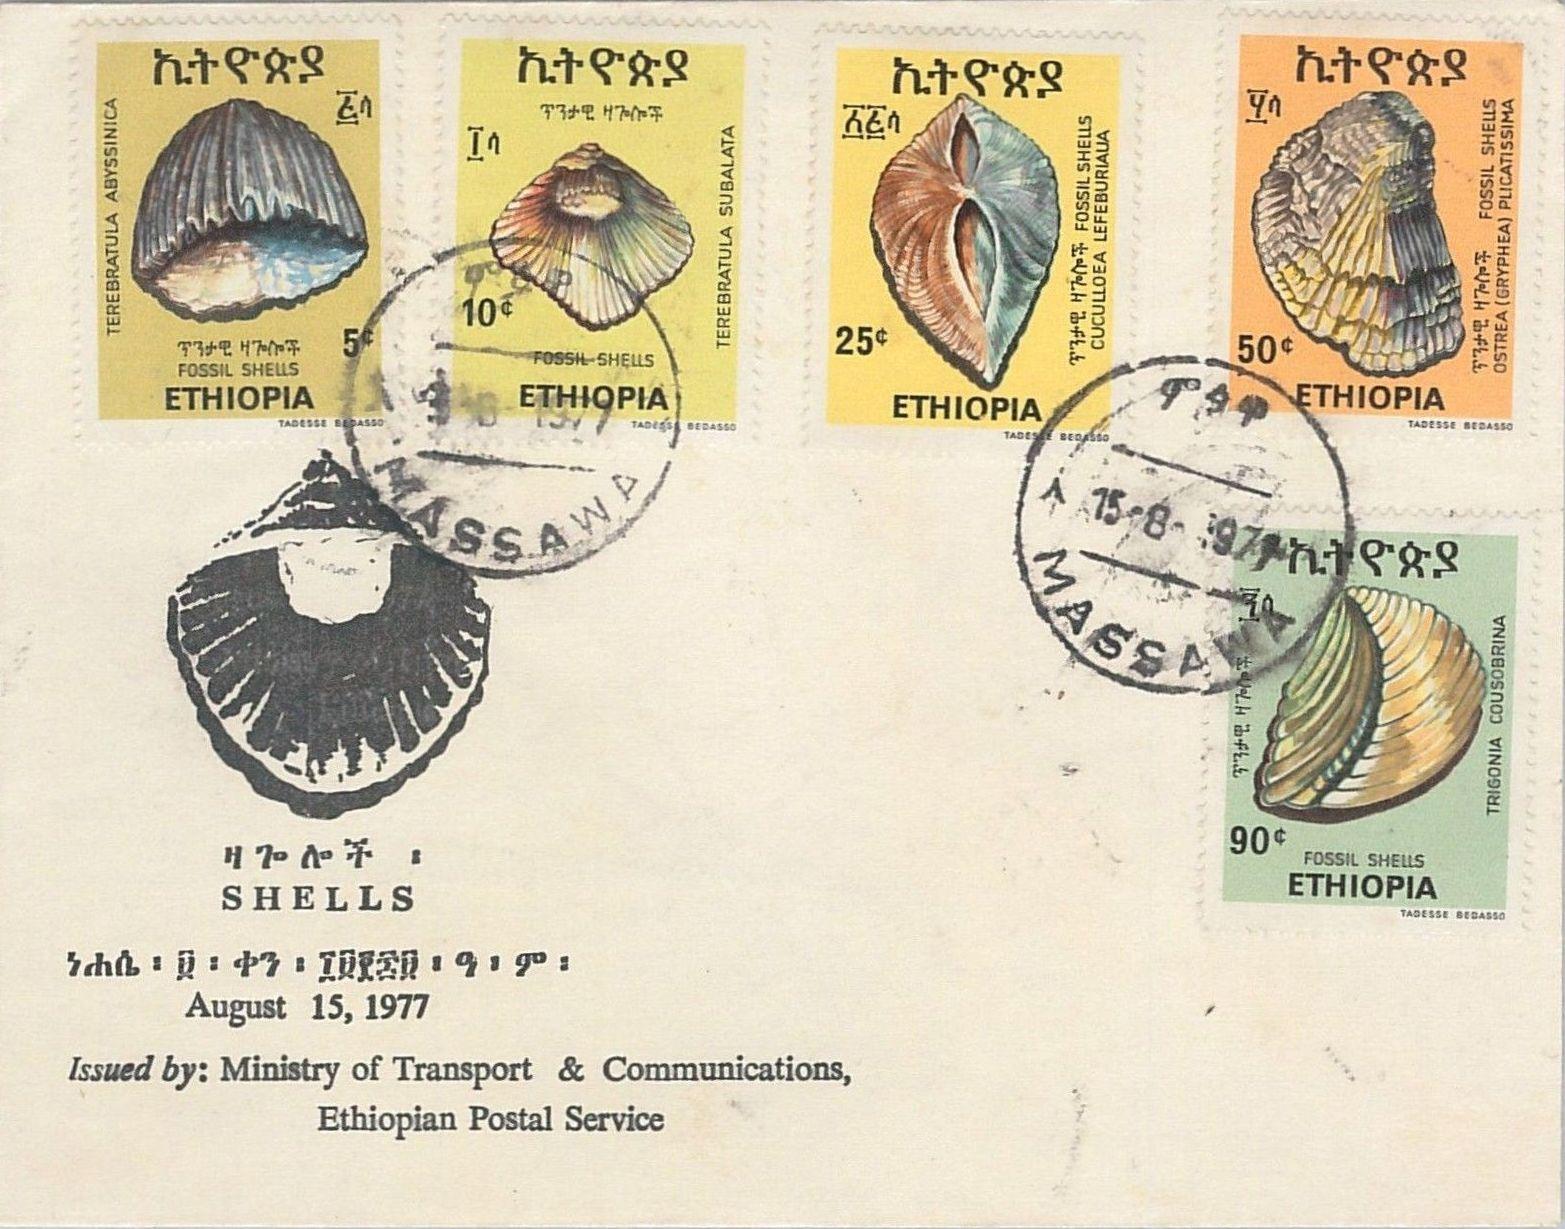 Ethiopia 1977 Fossil Shells FDCa.jpg